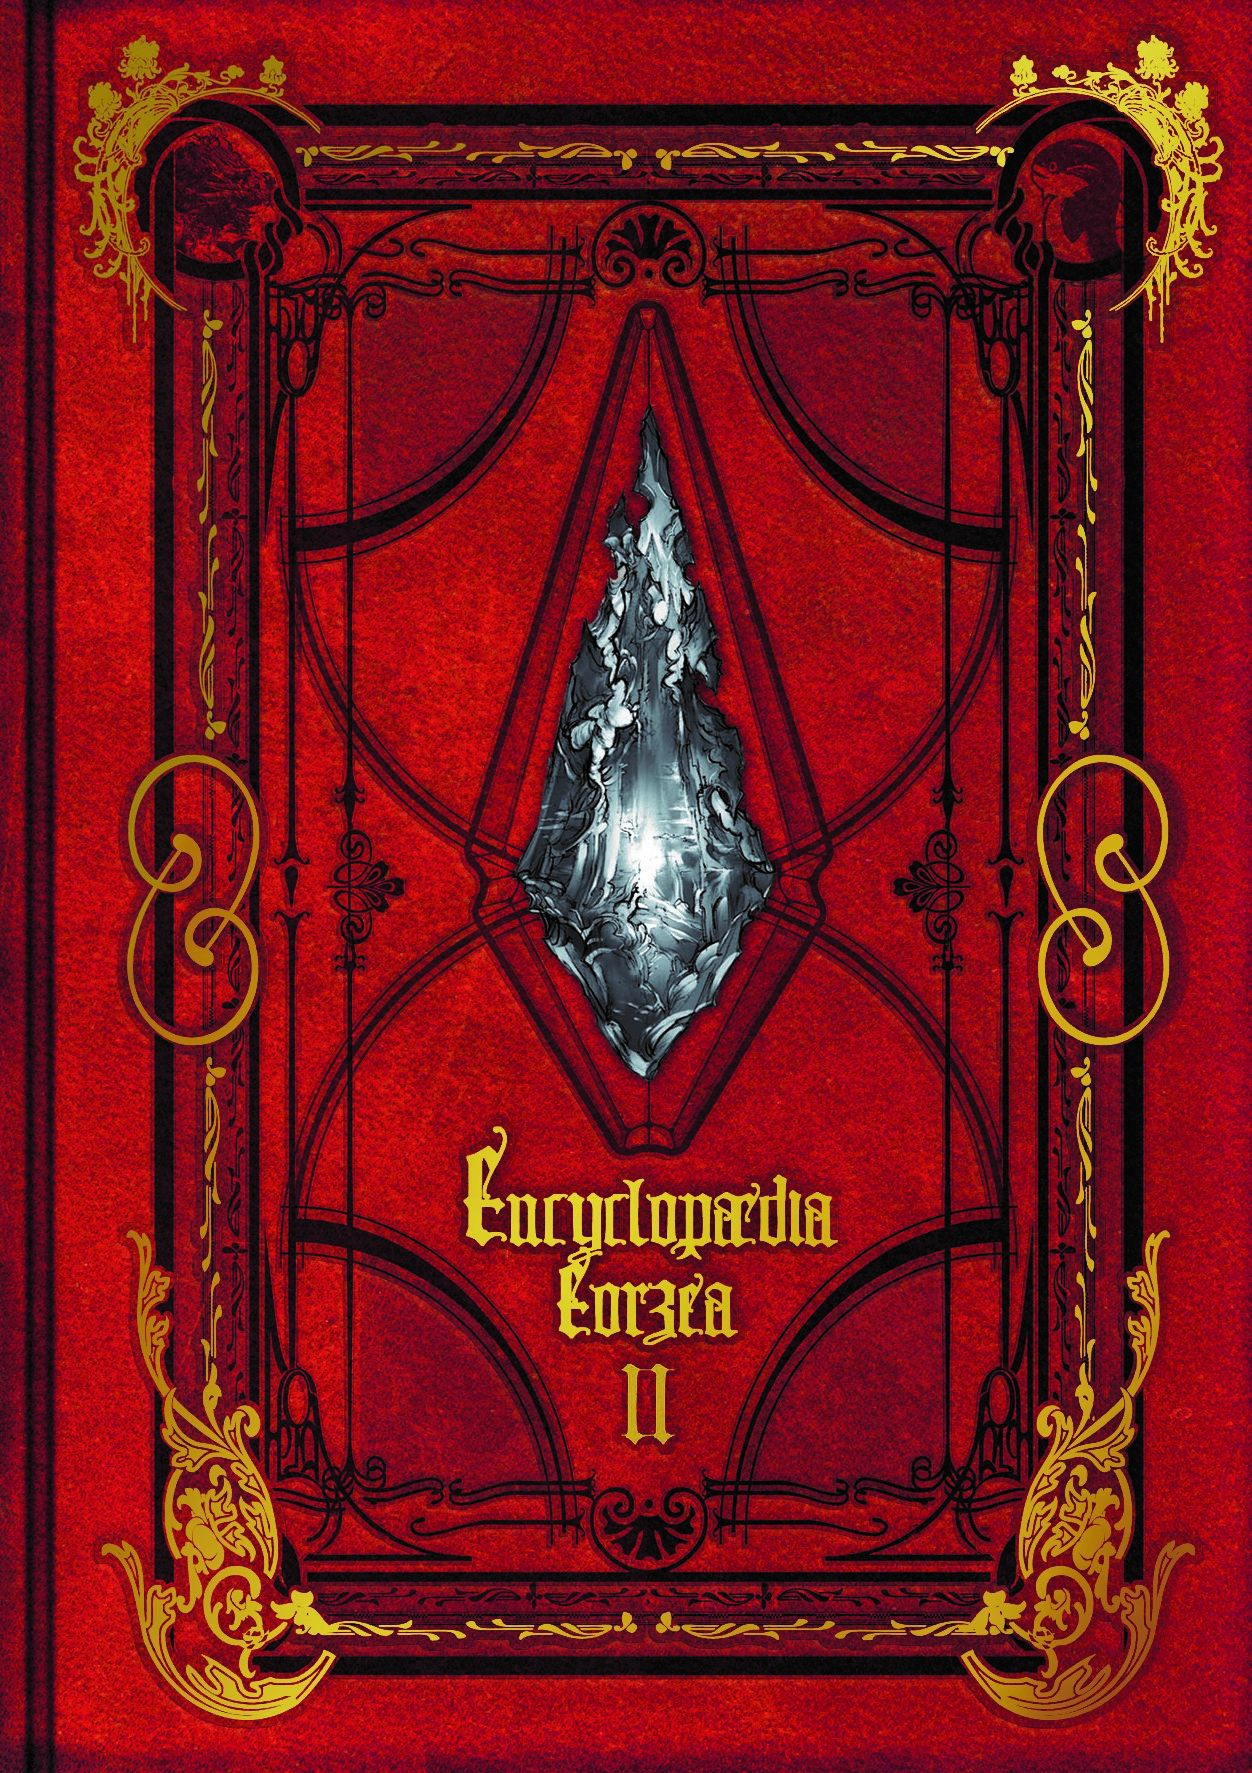 Encyclopædia Eorzea: The World of Final Fantasy XIV Volume II